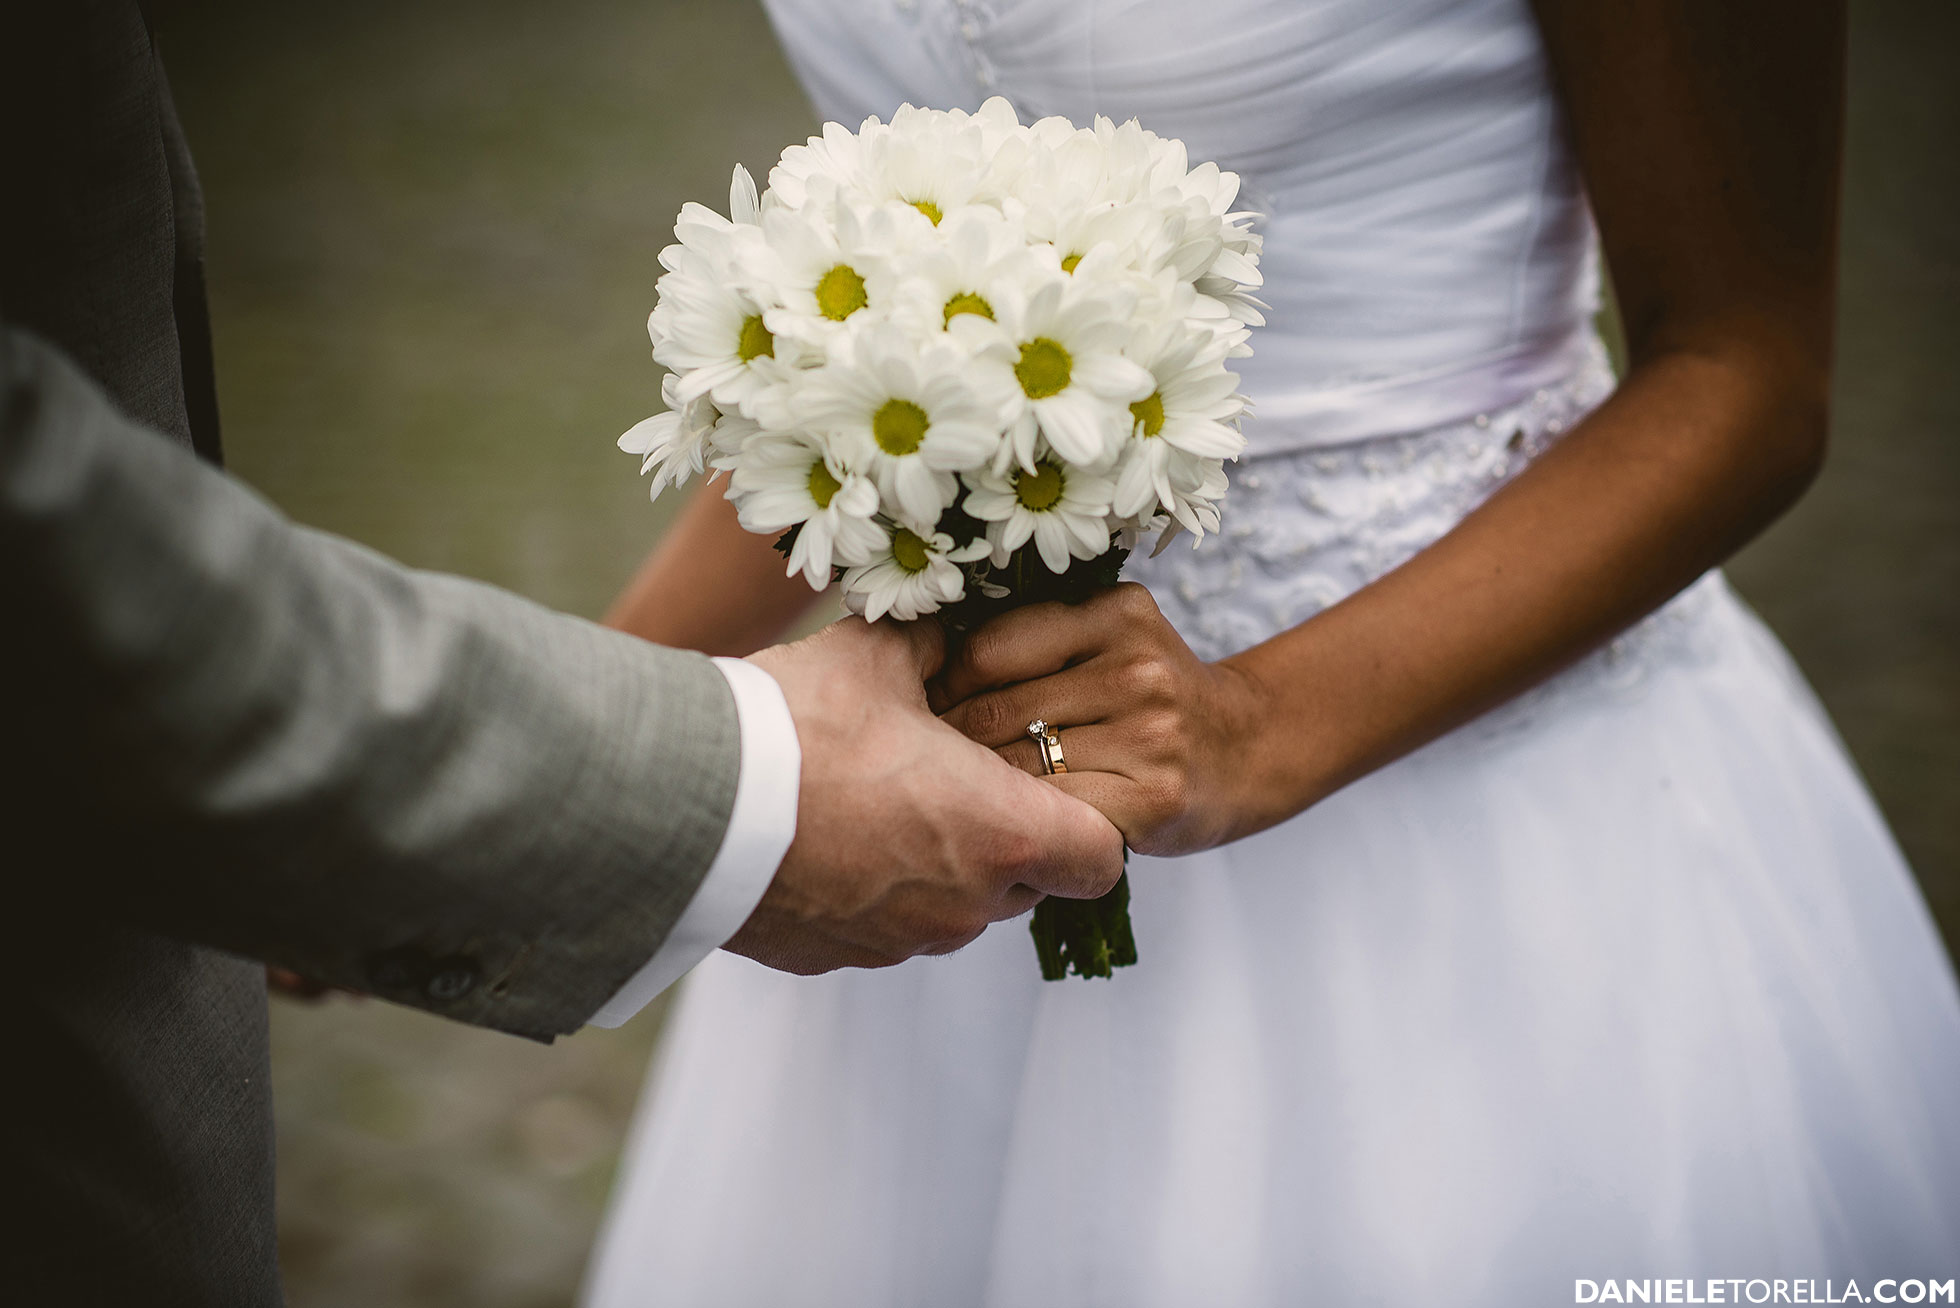 Matrimonio Al Mare Toscana : Matrimonio brasiliano al mare